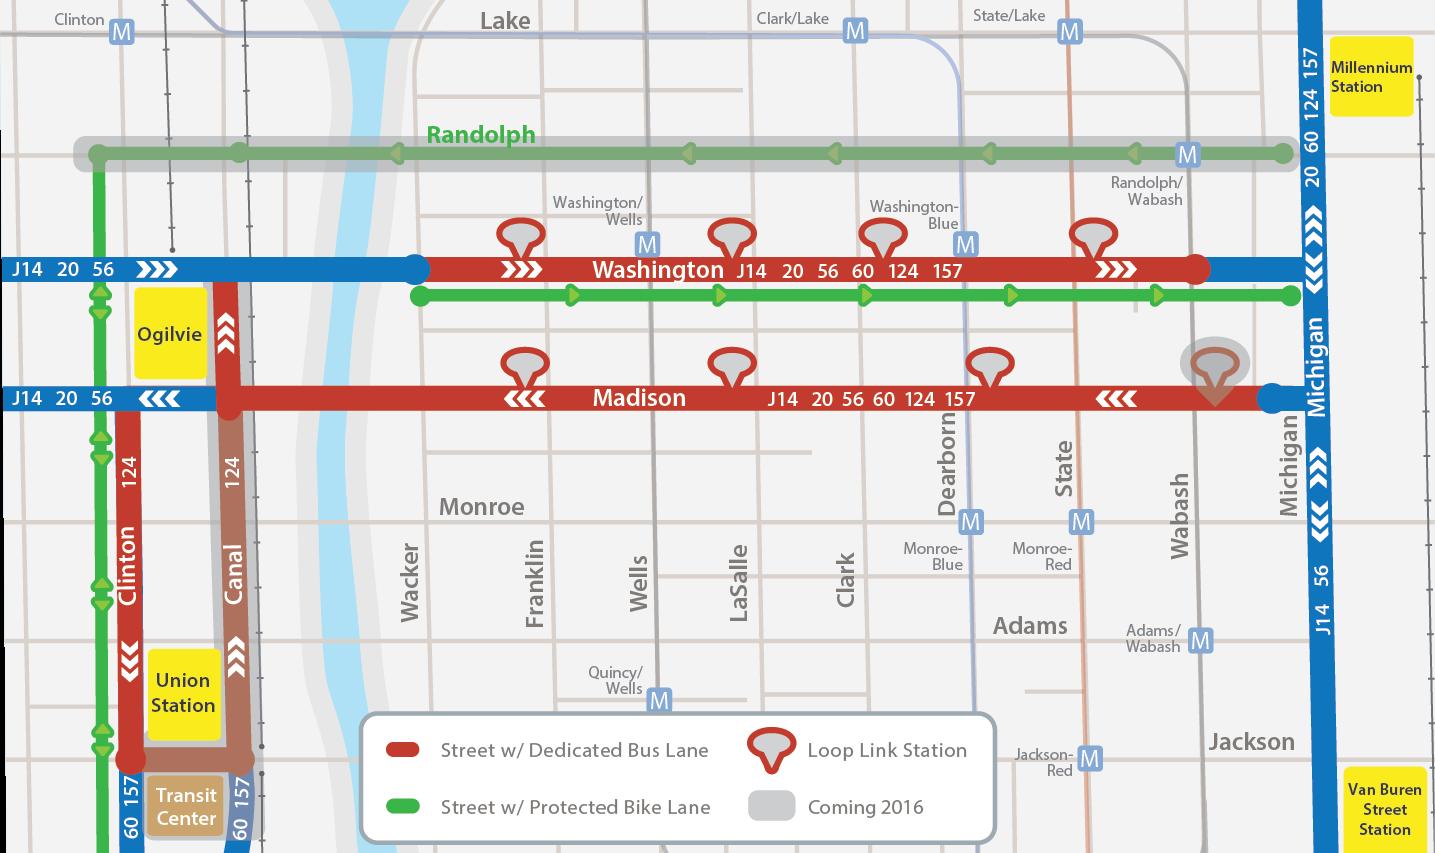 Sitetransitchicagocom Chicago Subway Map.Loop Link Cta